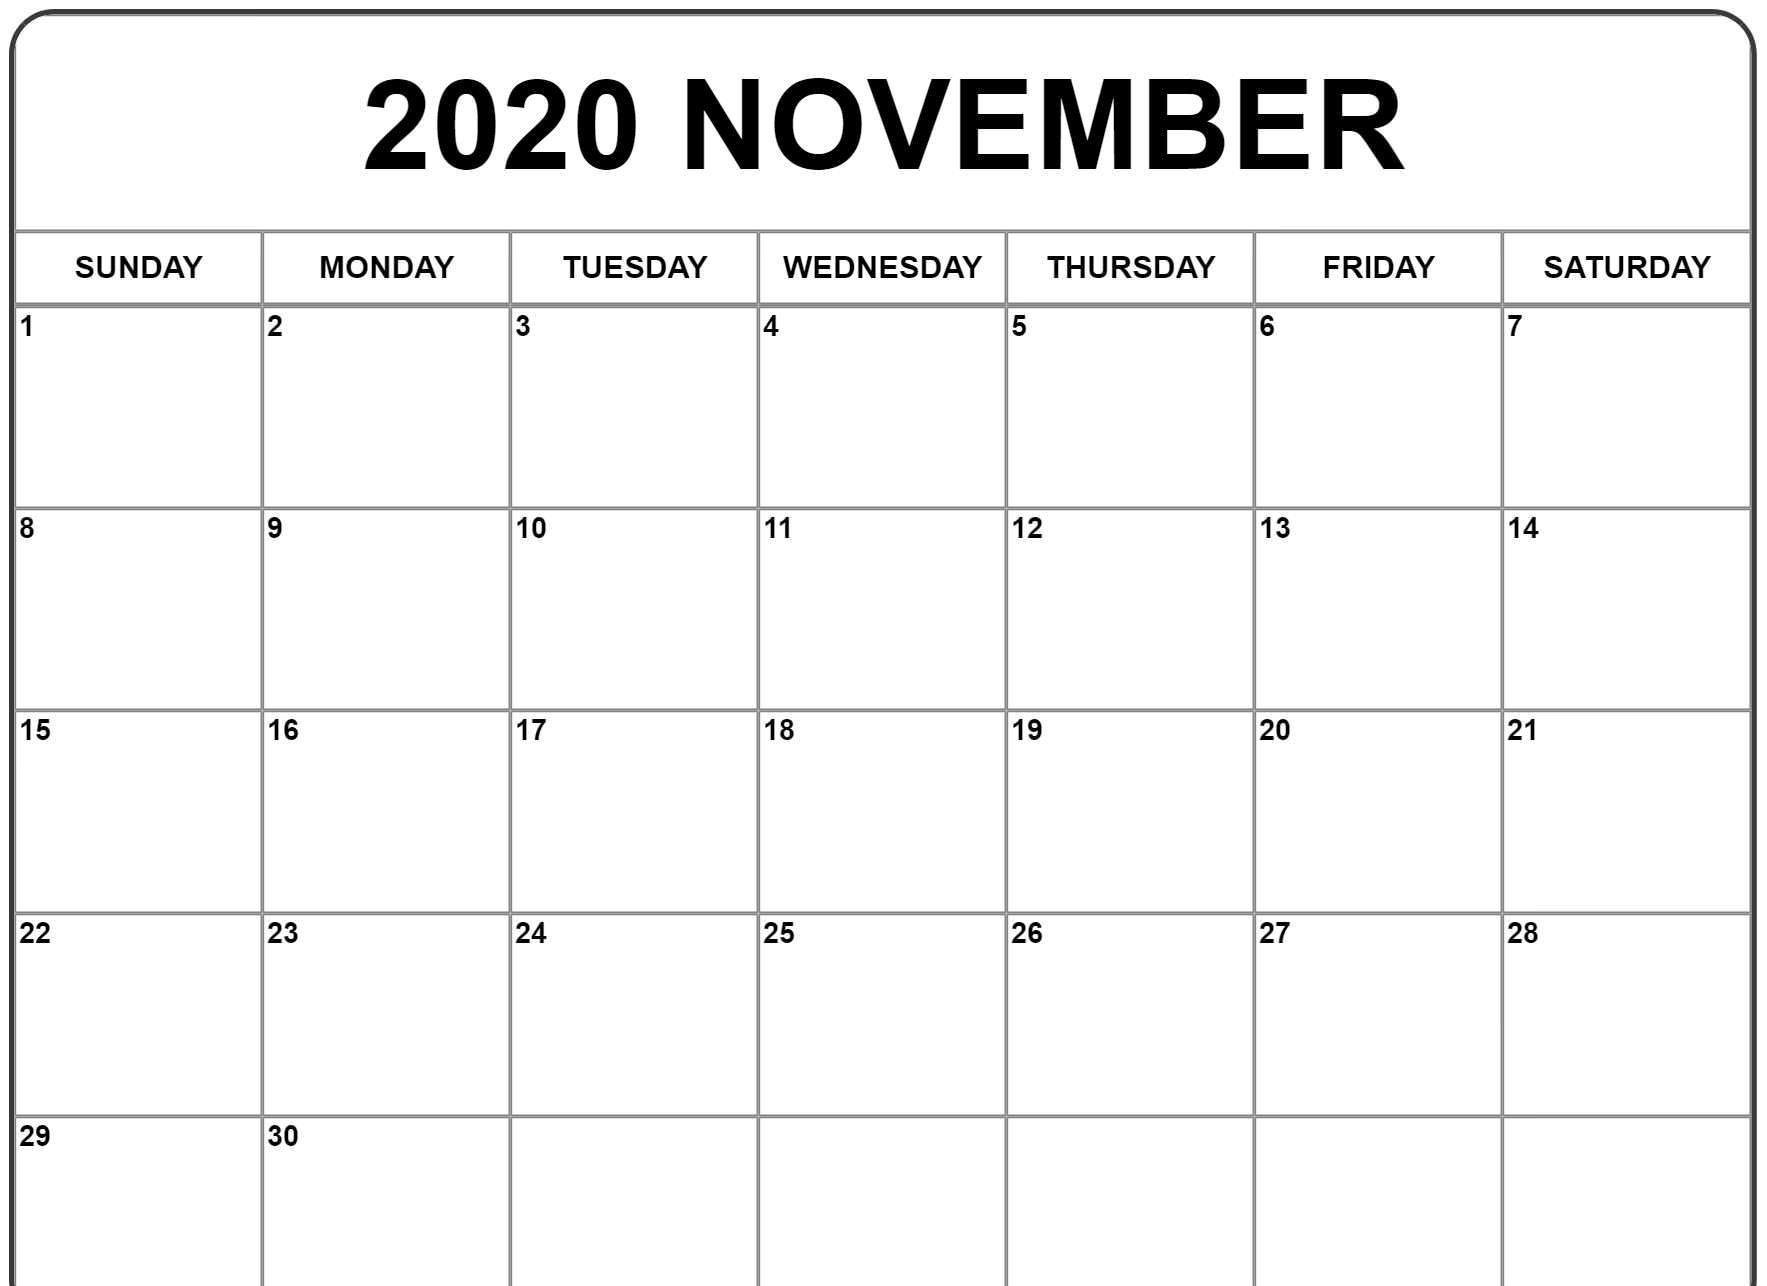 November 2020 Calendar In 2020 | Editable Calendar, Calendar November Calendar Template Kindergarten